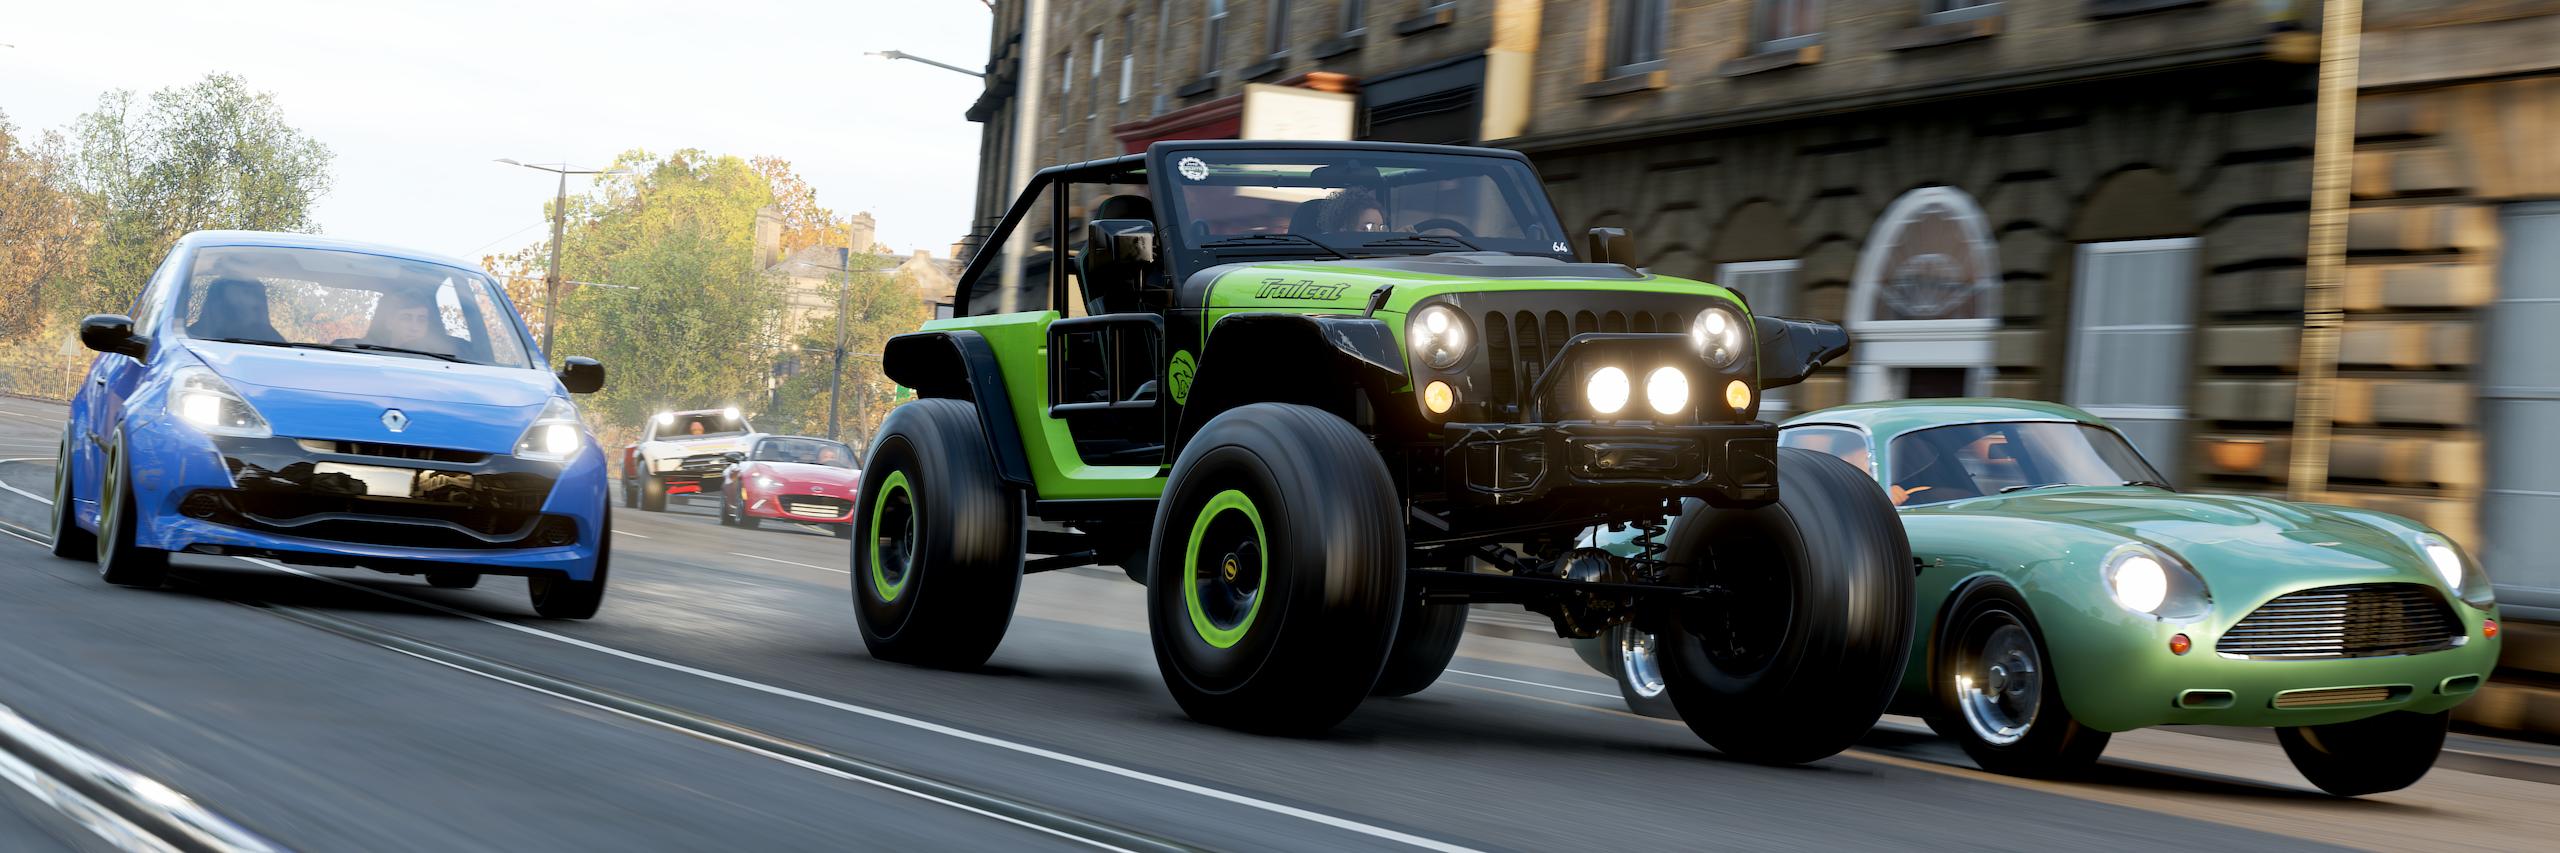 Обзор Forza Horizon 4 - Социалка на колёсах. - Изображение 5